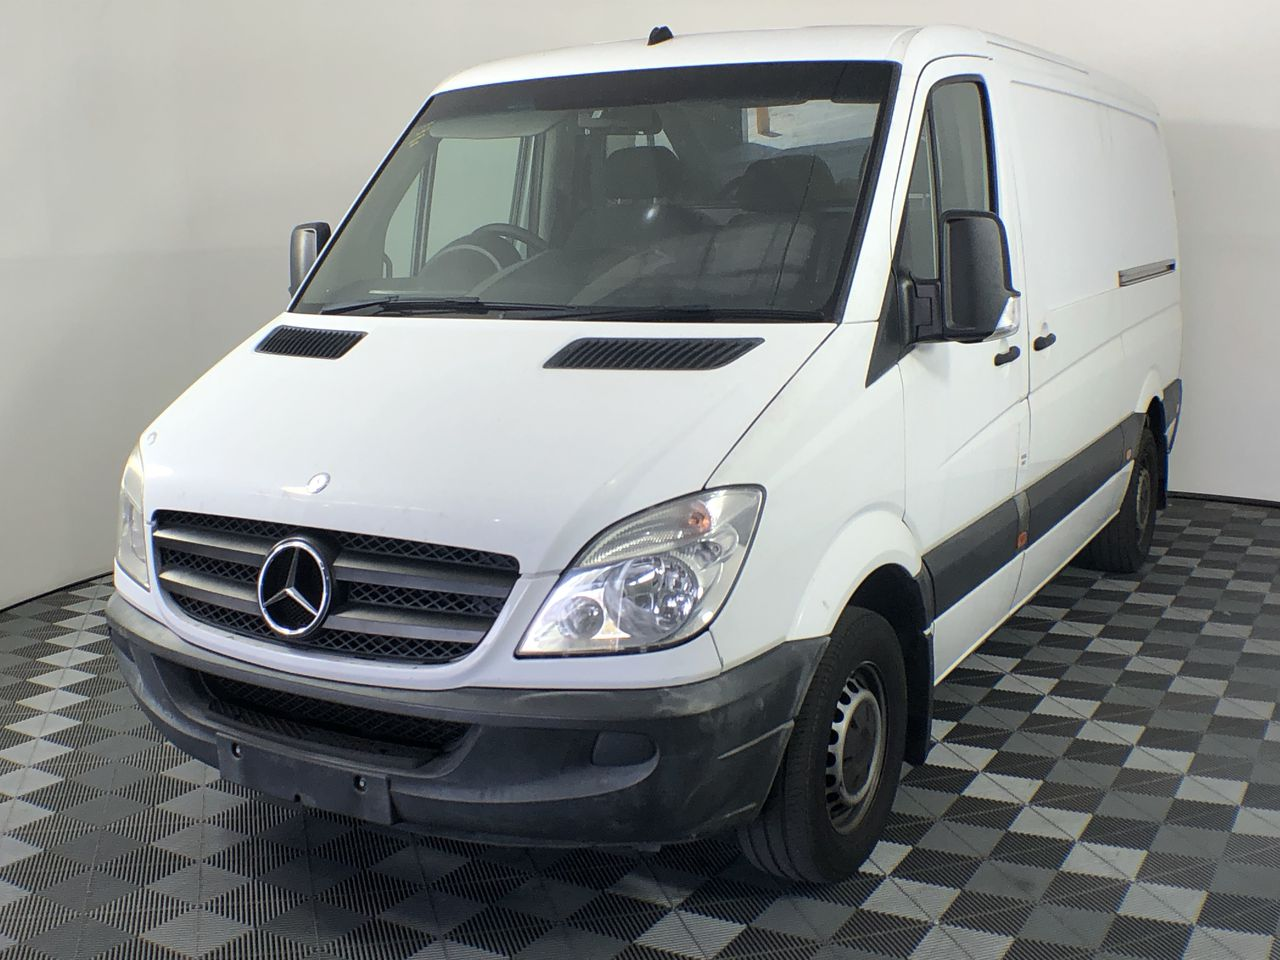 2011 Mercedes Benz Sprinter 313 CDI MWB Turbo Diesel Automatic Van